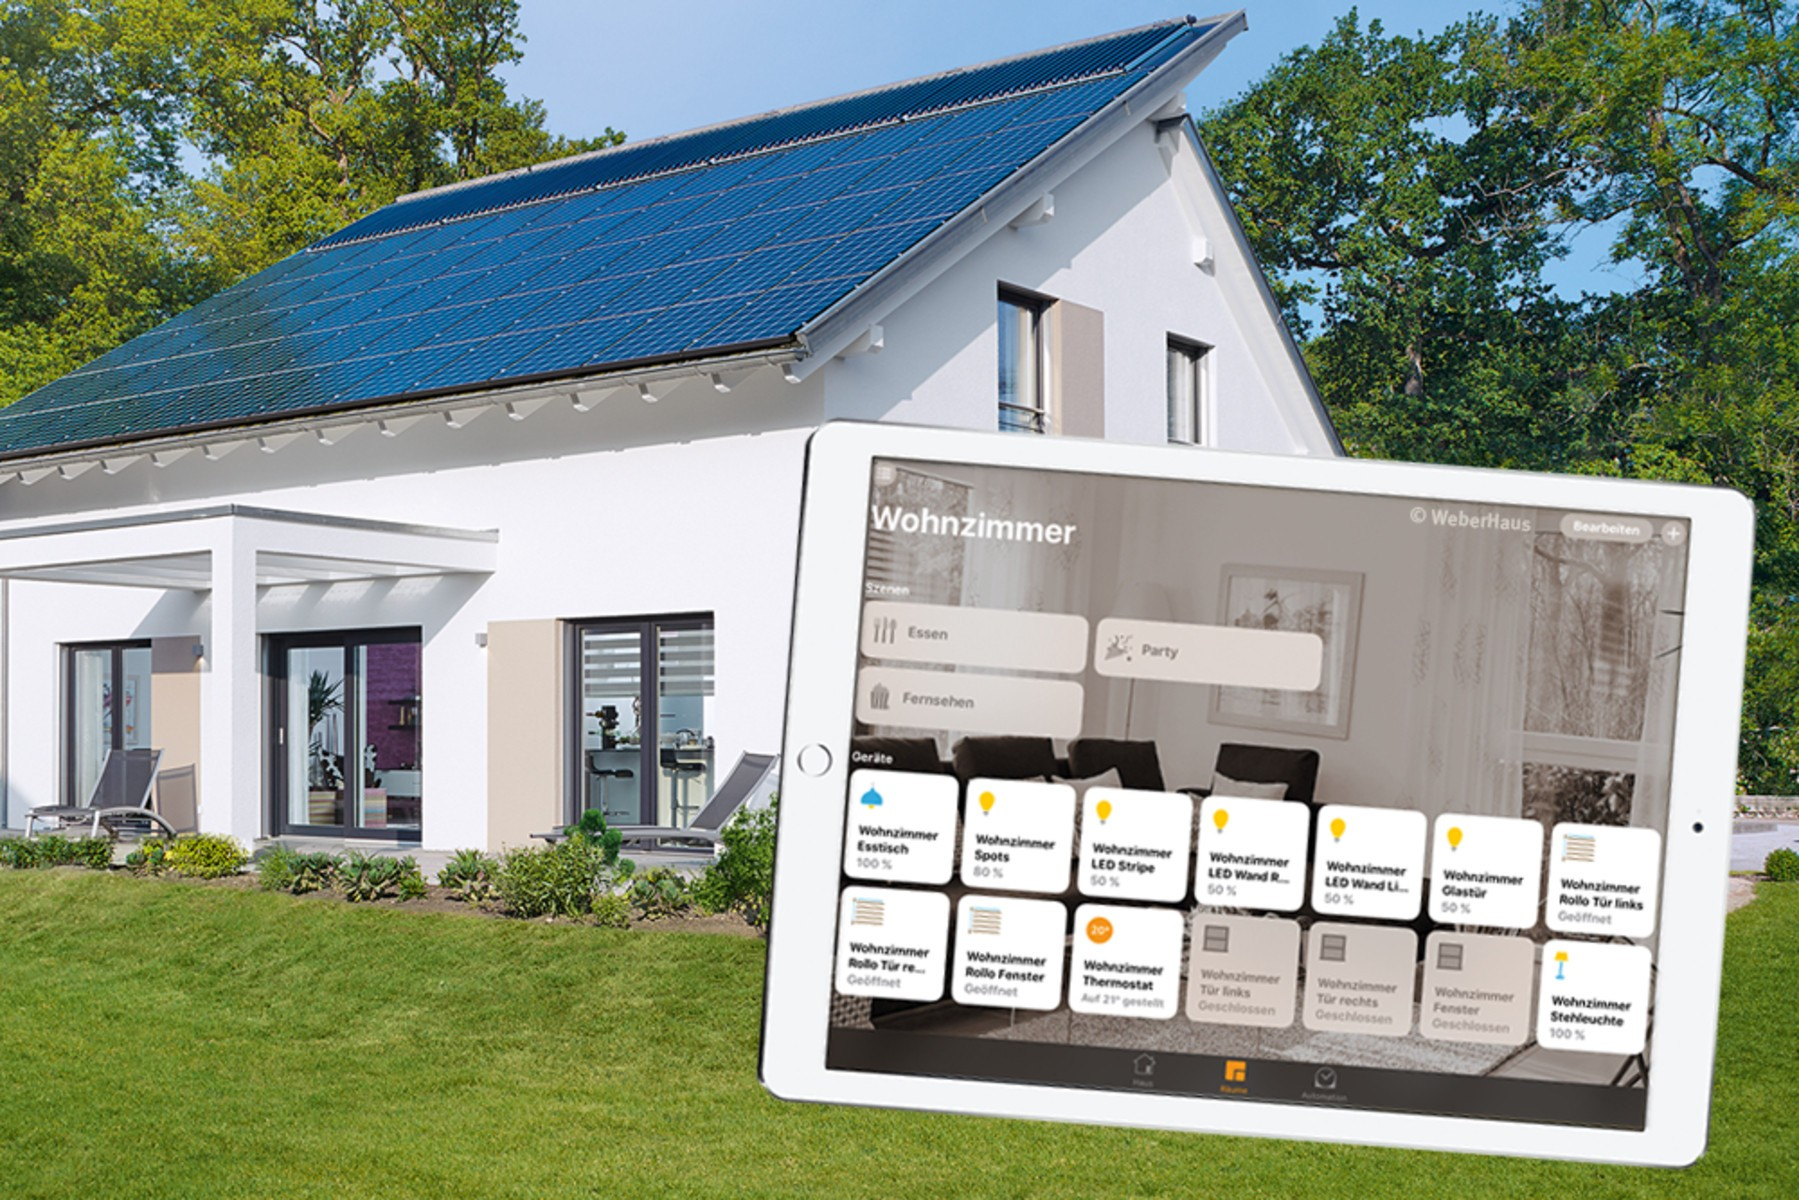 Fabulous WeberHaus - WeberHaus setzt auf Apple HomeKit bei neuen Haus-Projekten TZ57